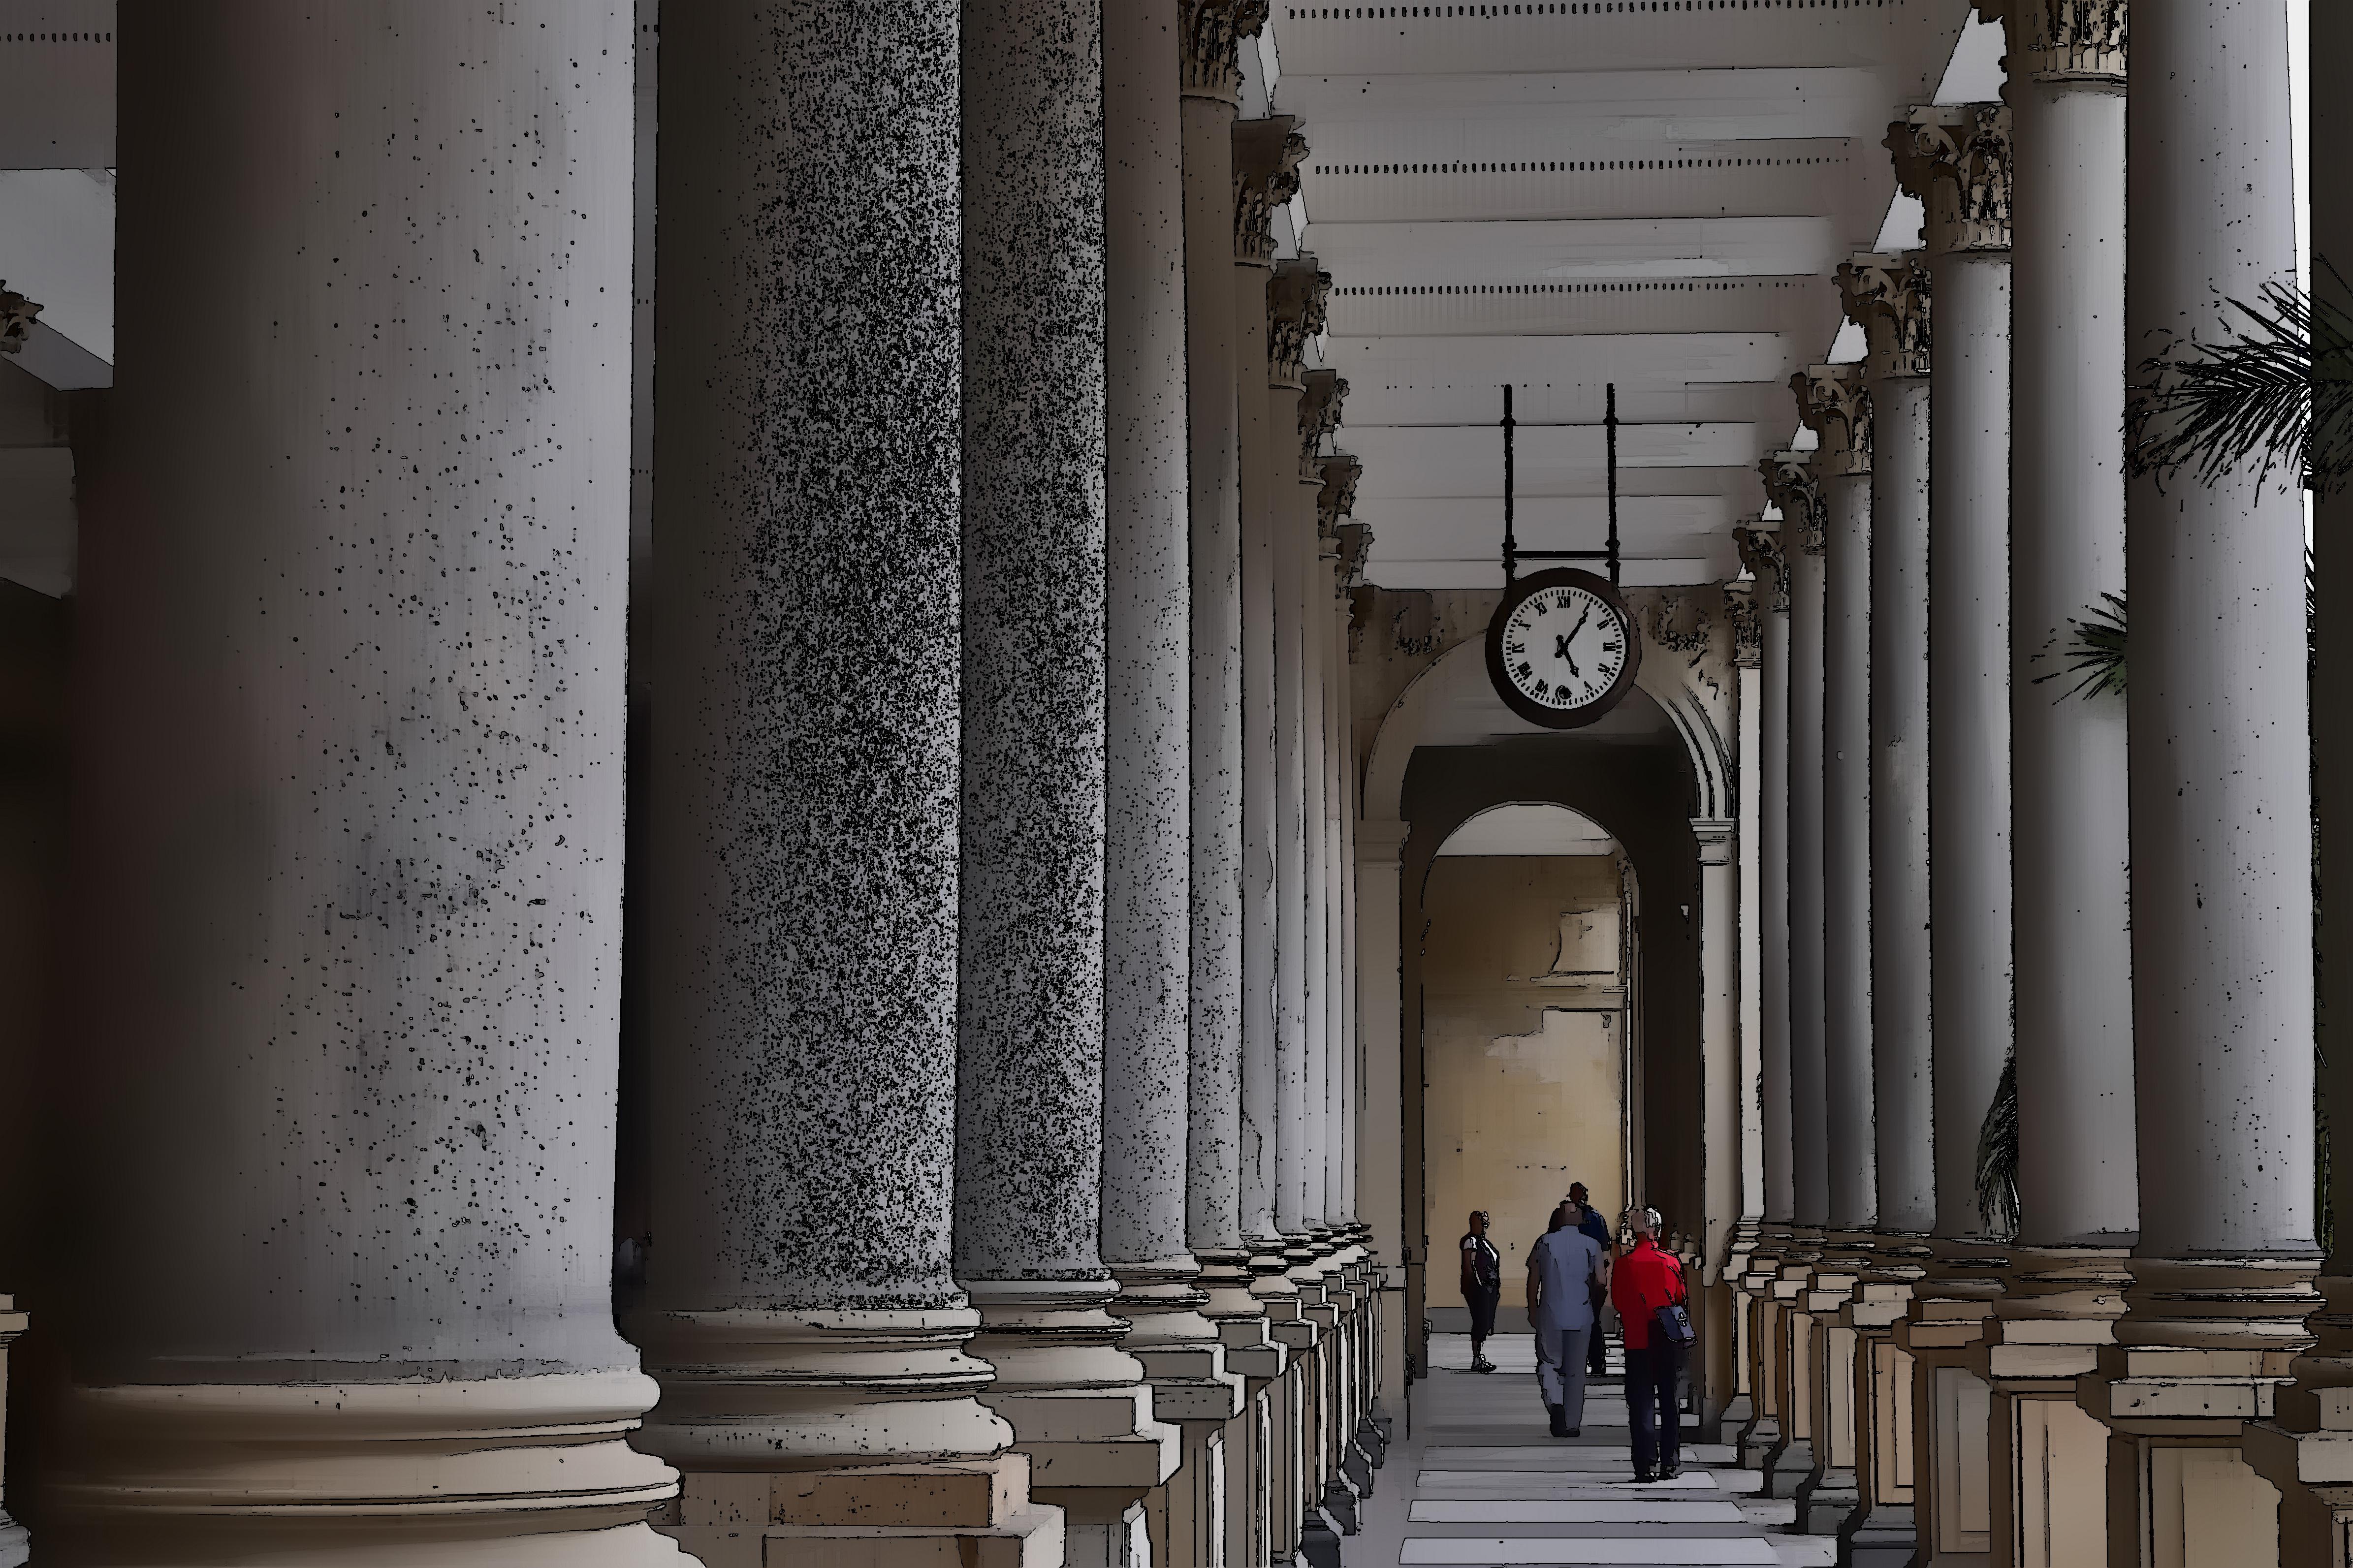 Säulengang / colonnade